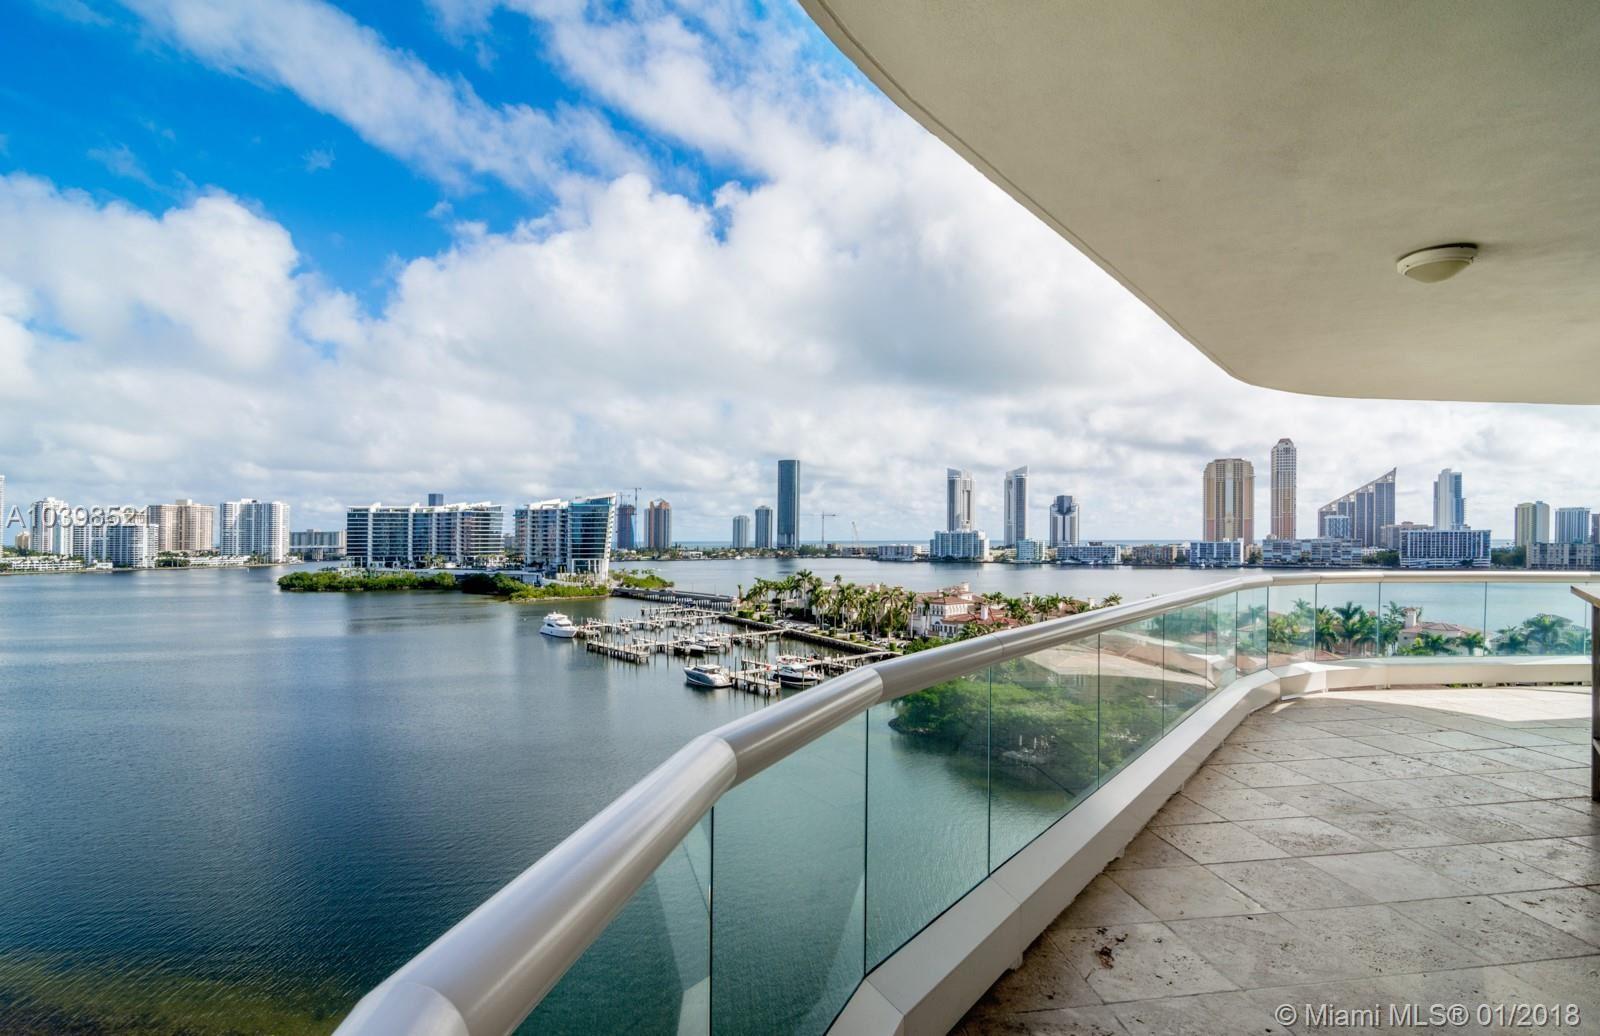 6000 Island Blvd #1001, Aventura, FL 33160 - #: A10398521